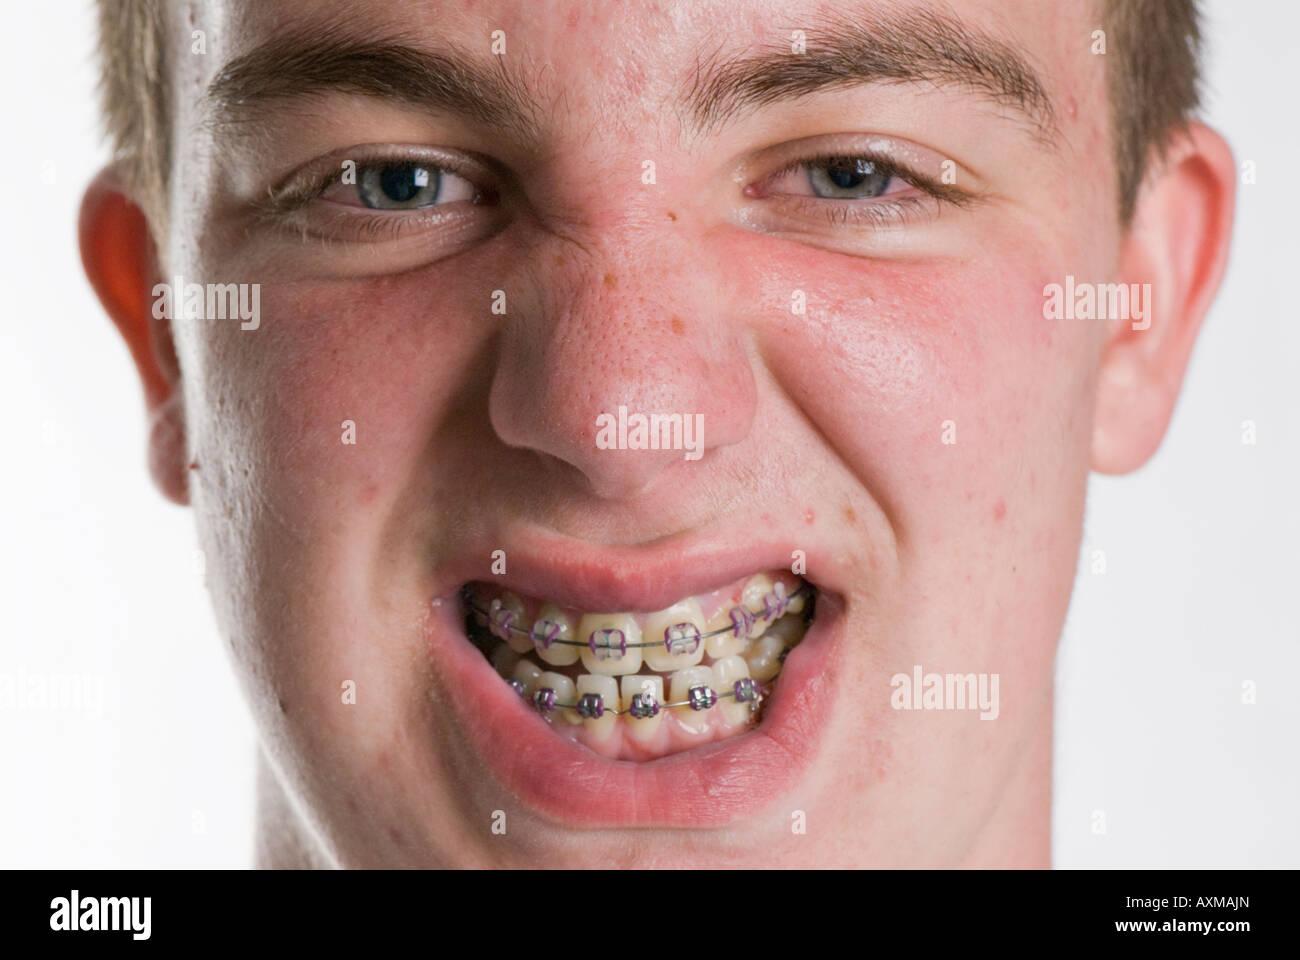 Acne Teen Stock Photos & Acne Teen Stock Images - Alamy